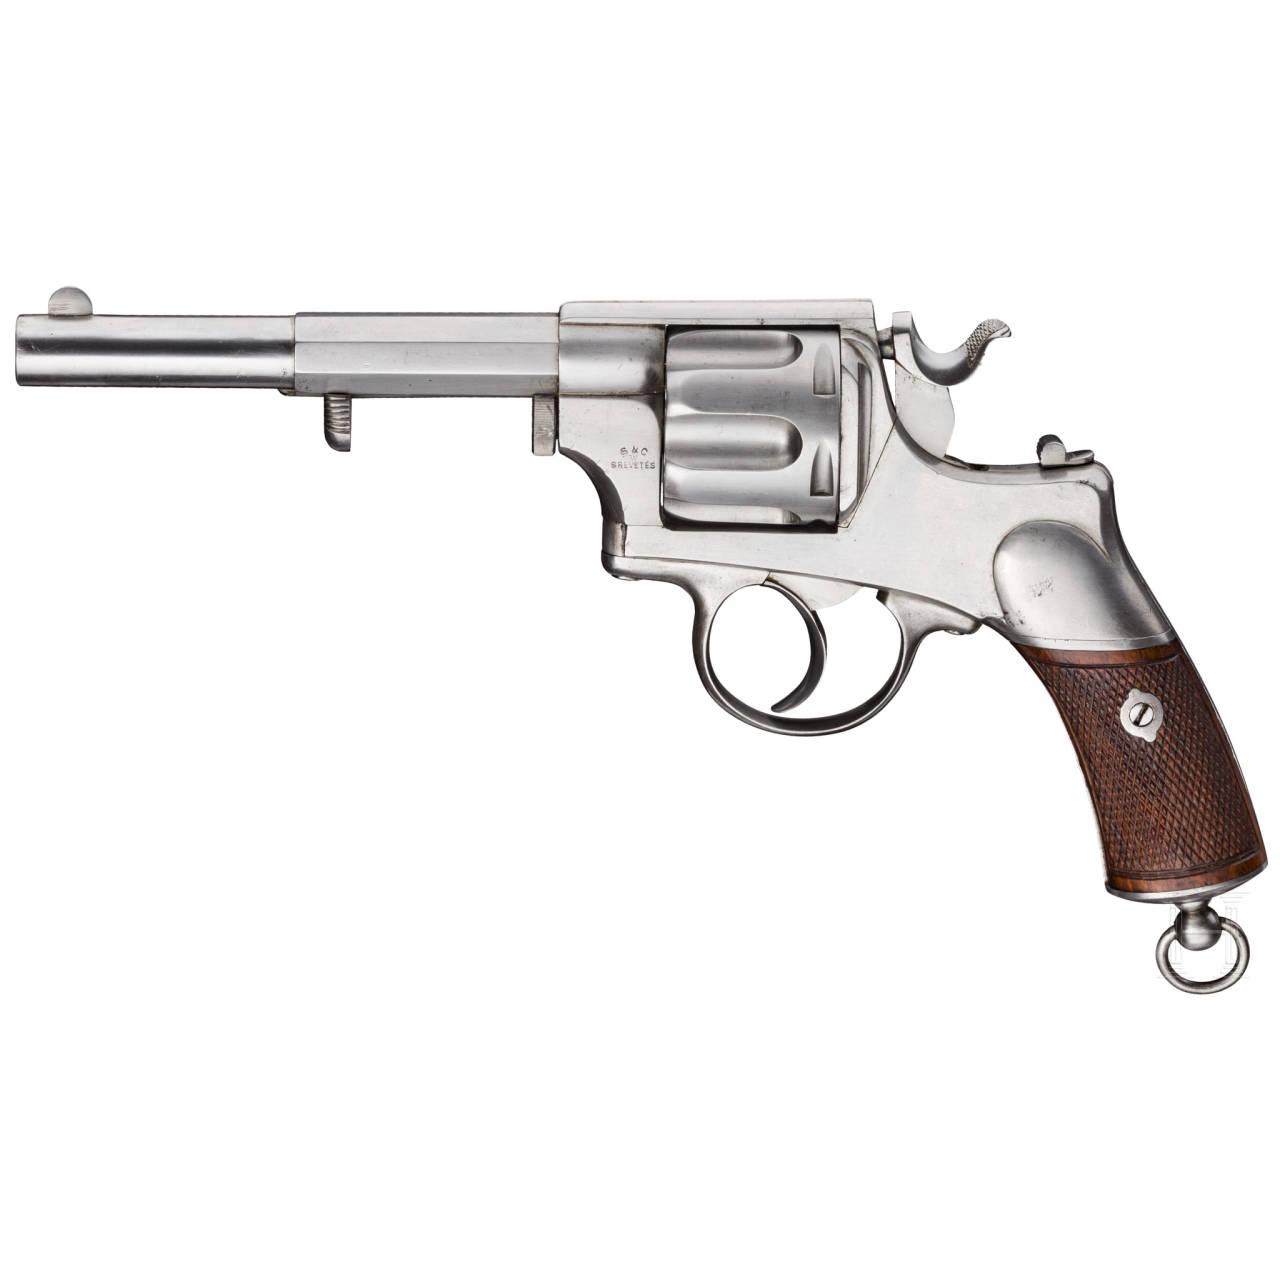 Revolver System Warnant, Scholberg & Gadet, Liège, Prototyp (?) für das KSKM